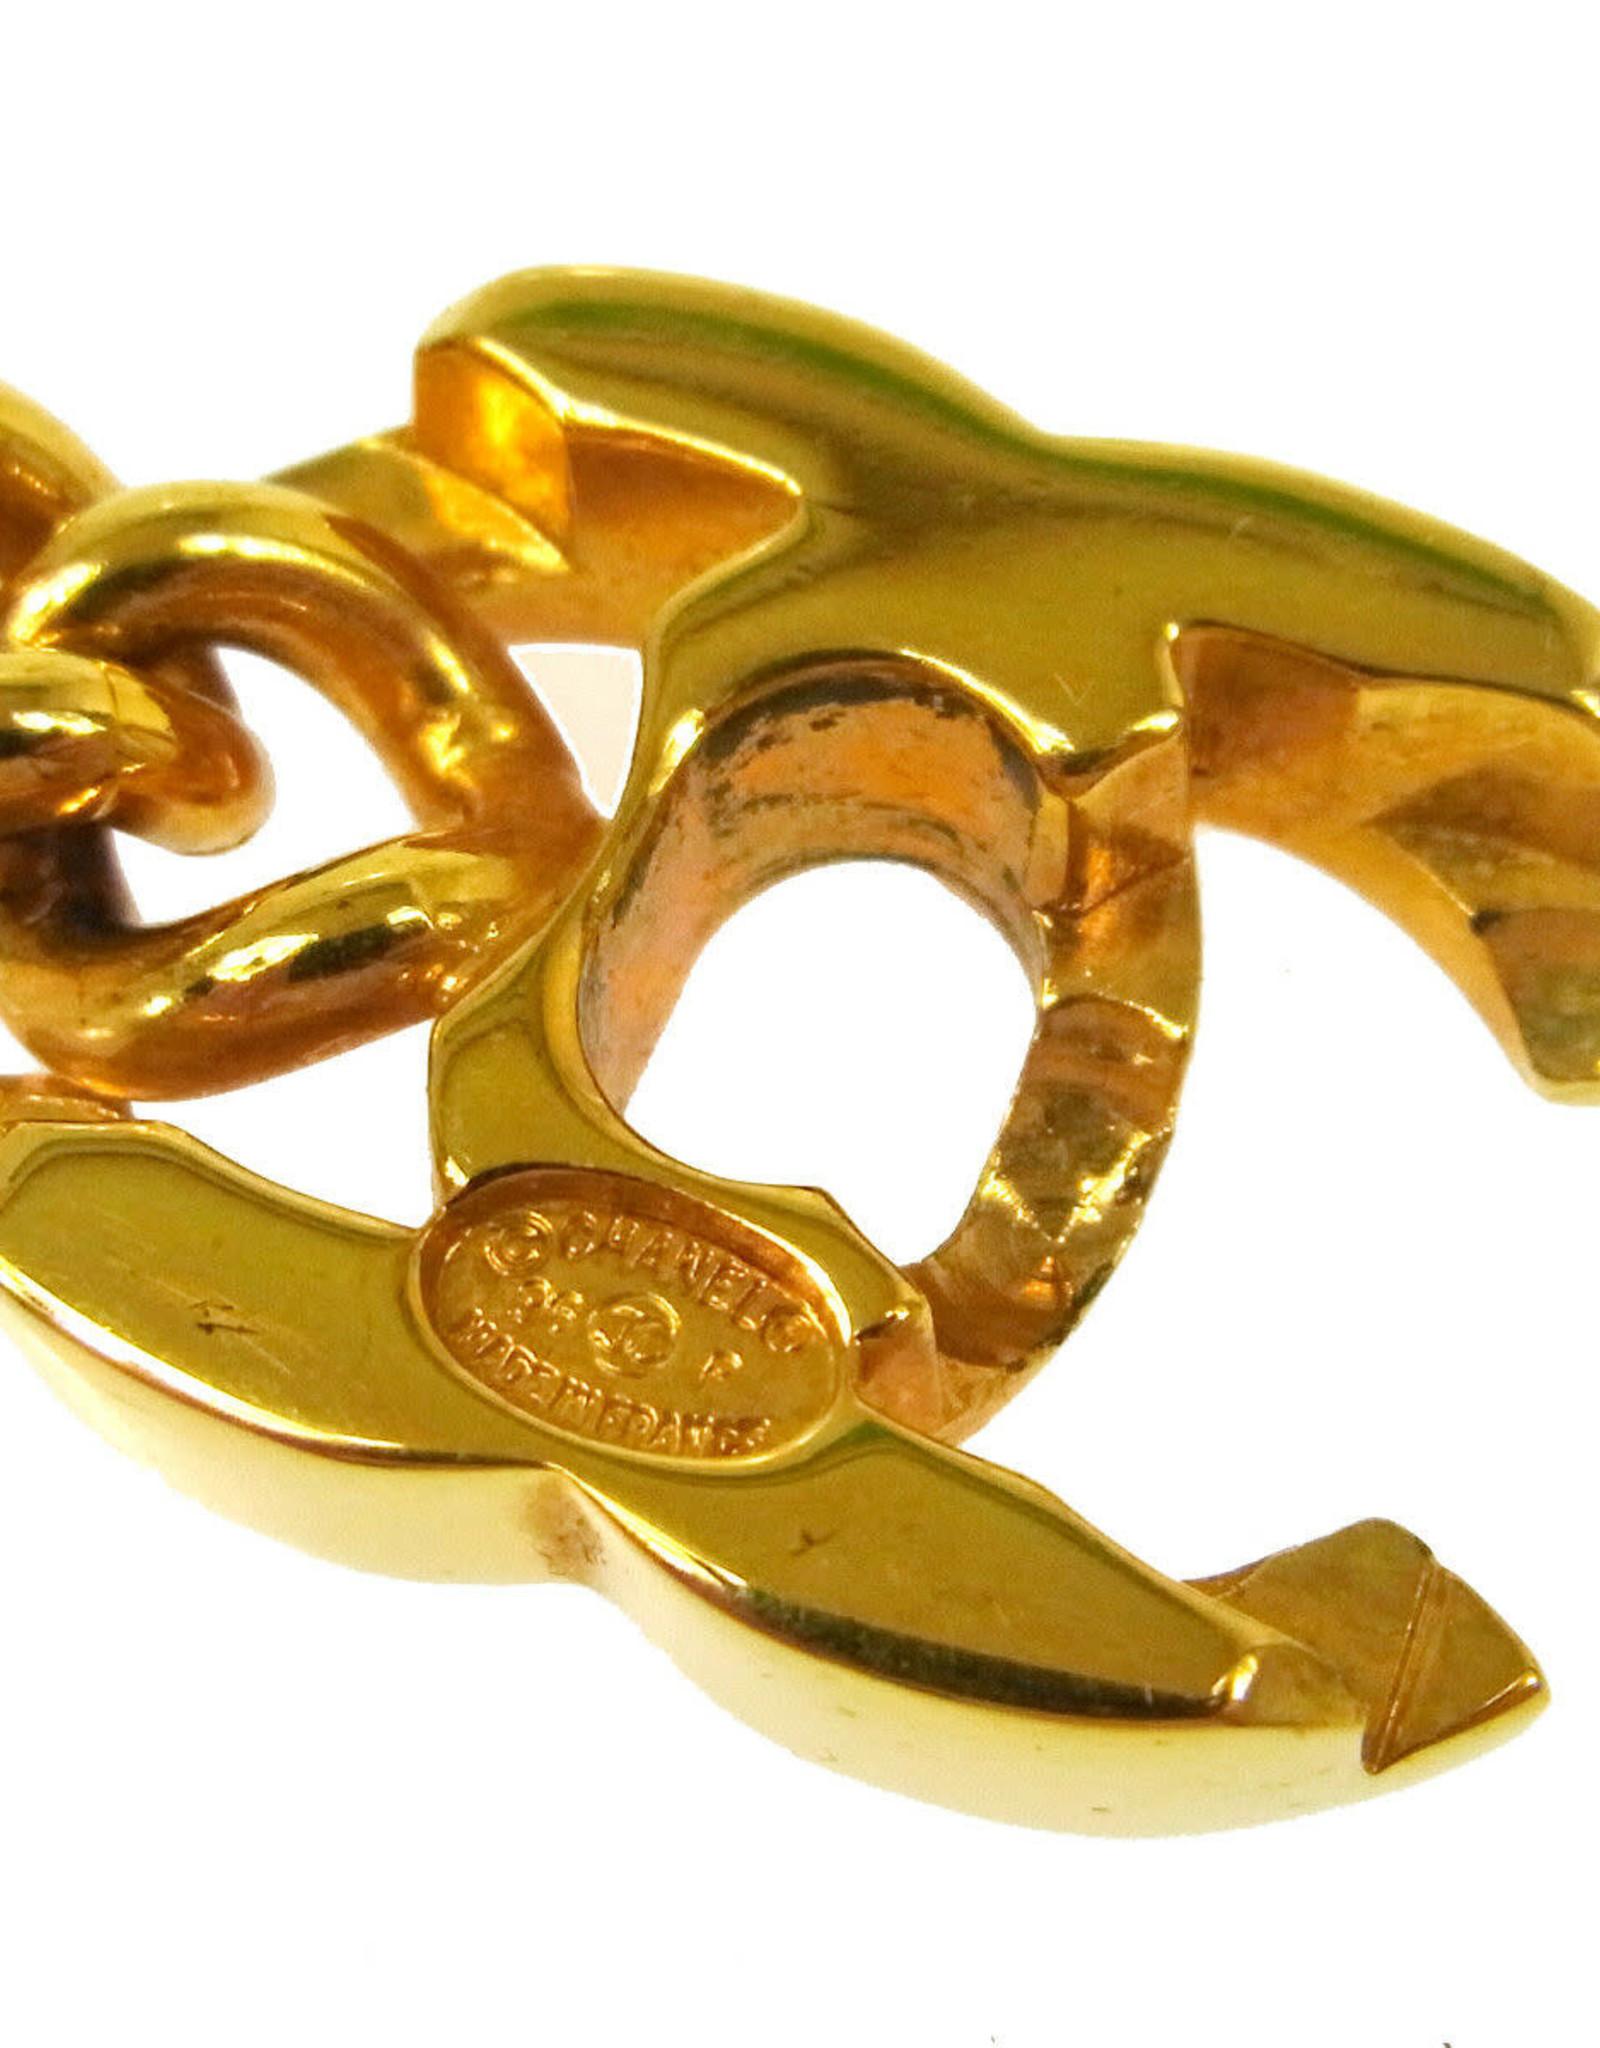 Chanel Chanel Turnlock Gold Chain Bracelet (1995 Vintage)